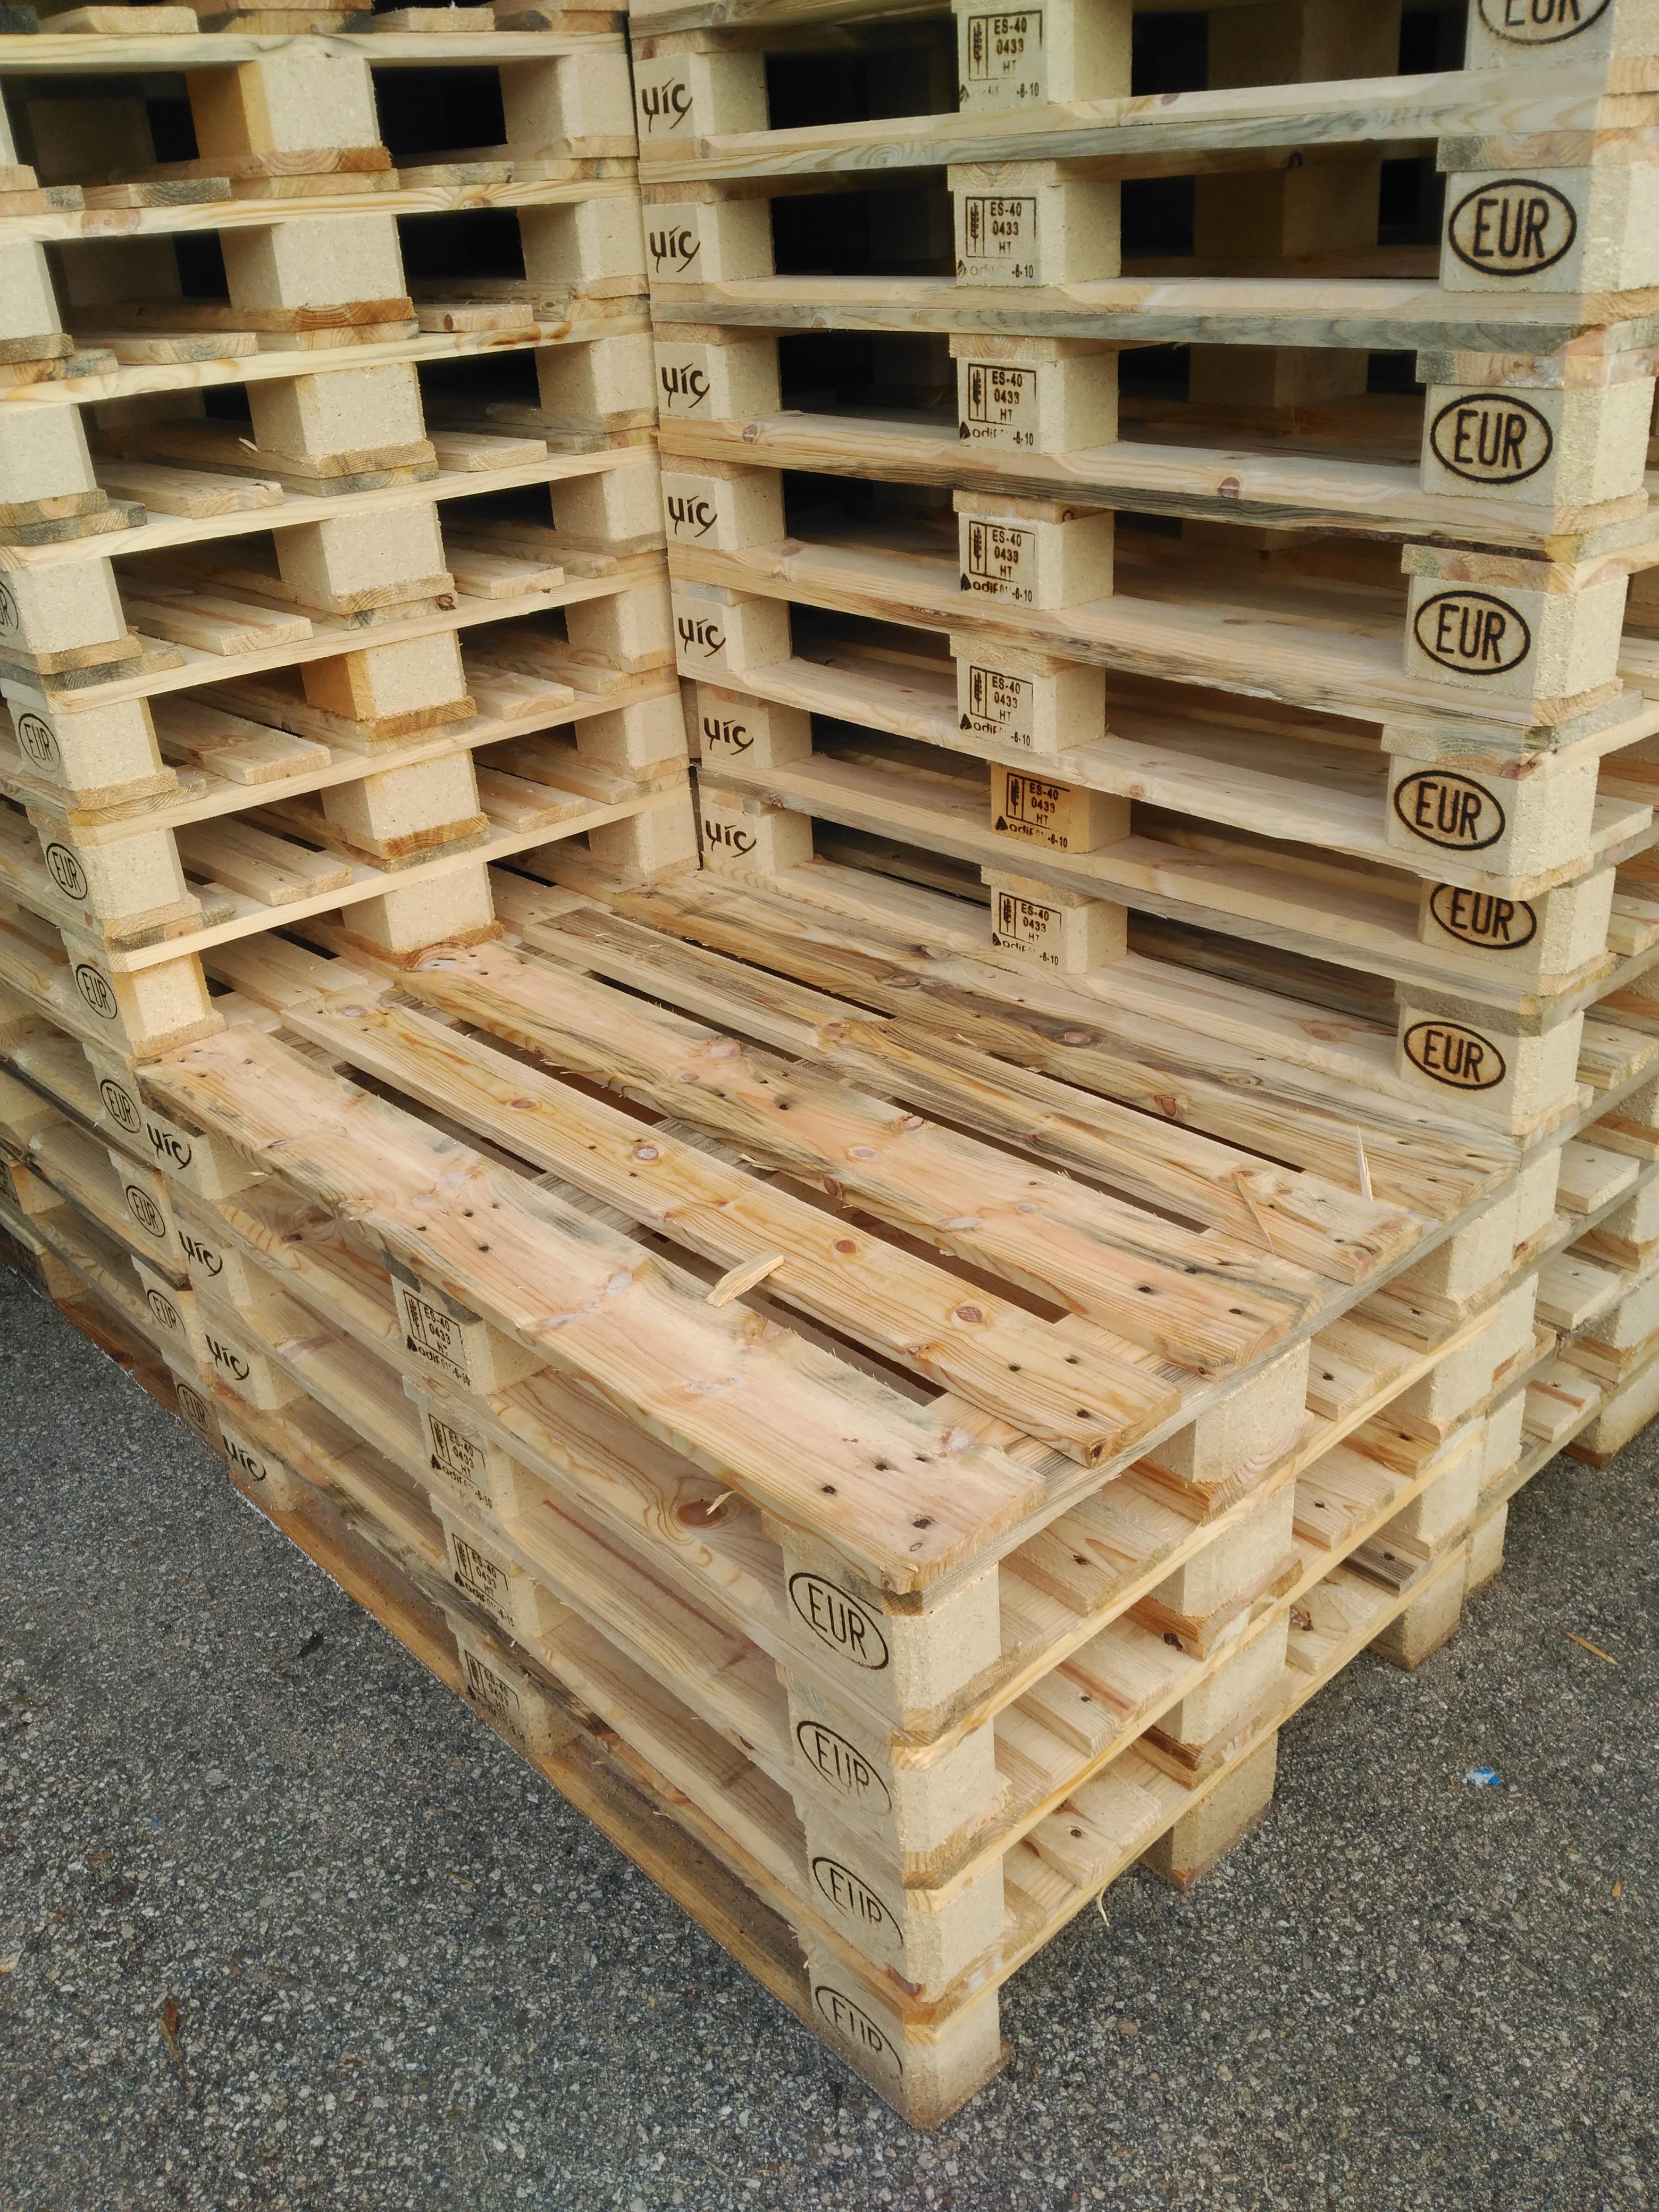 madera apilar mueble agricultura mimbre almacn producto palets objeto hecho por el hombre europallet